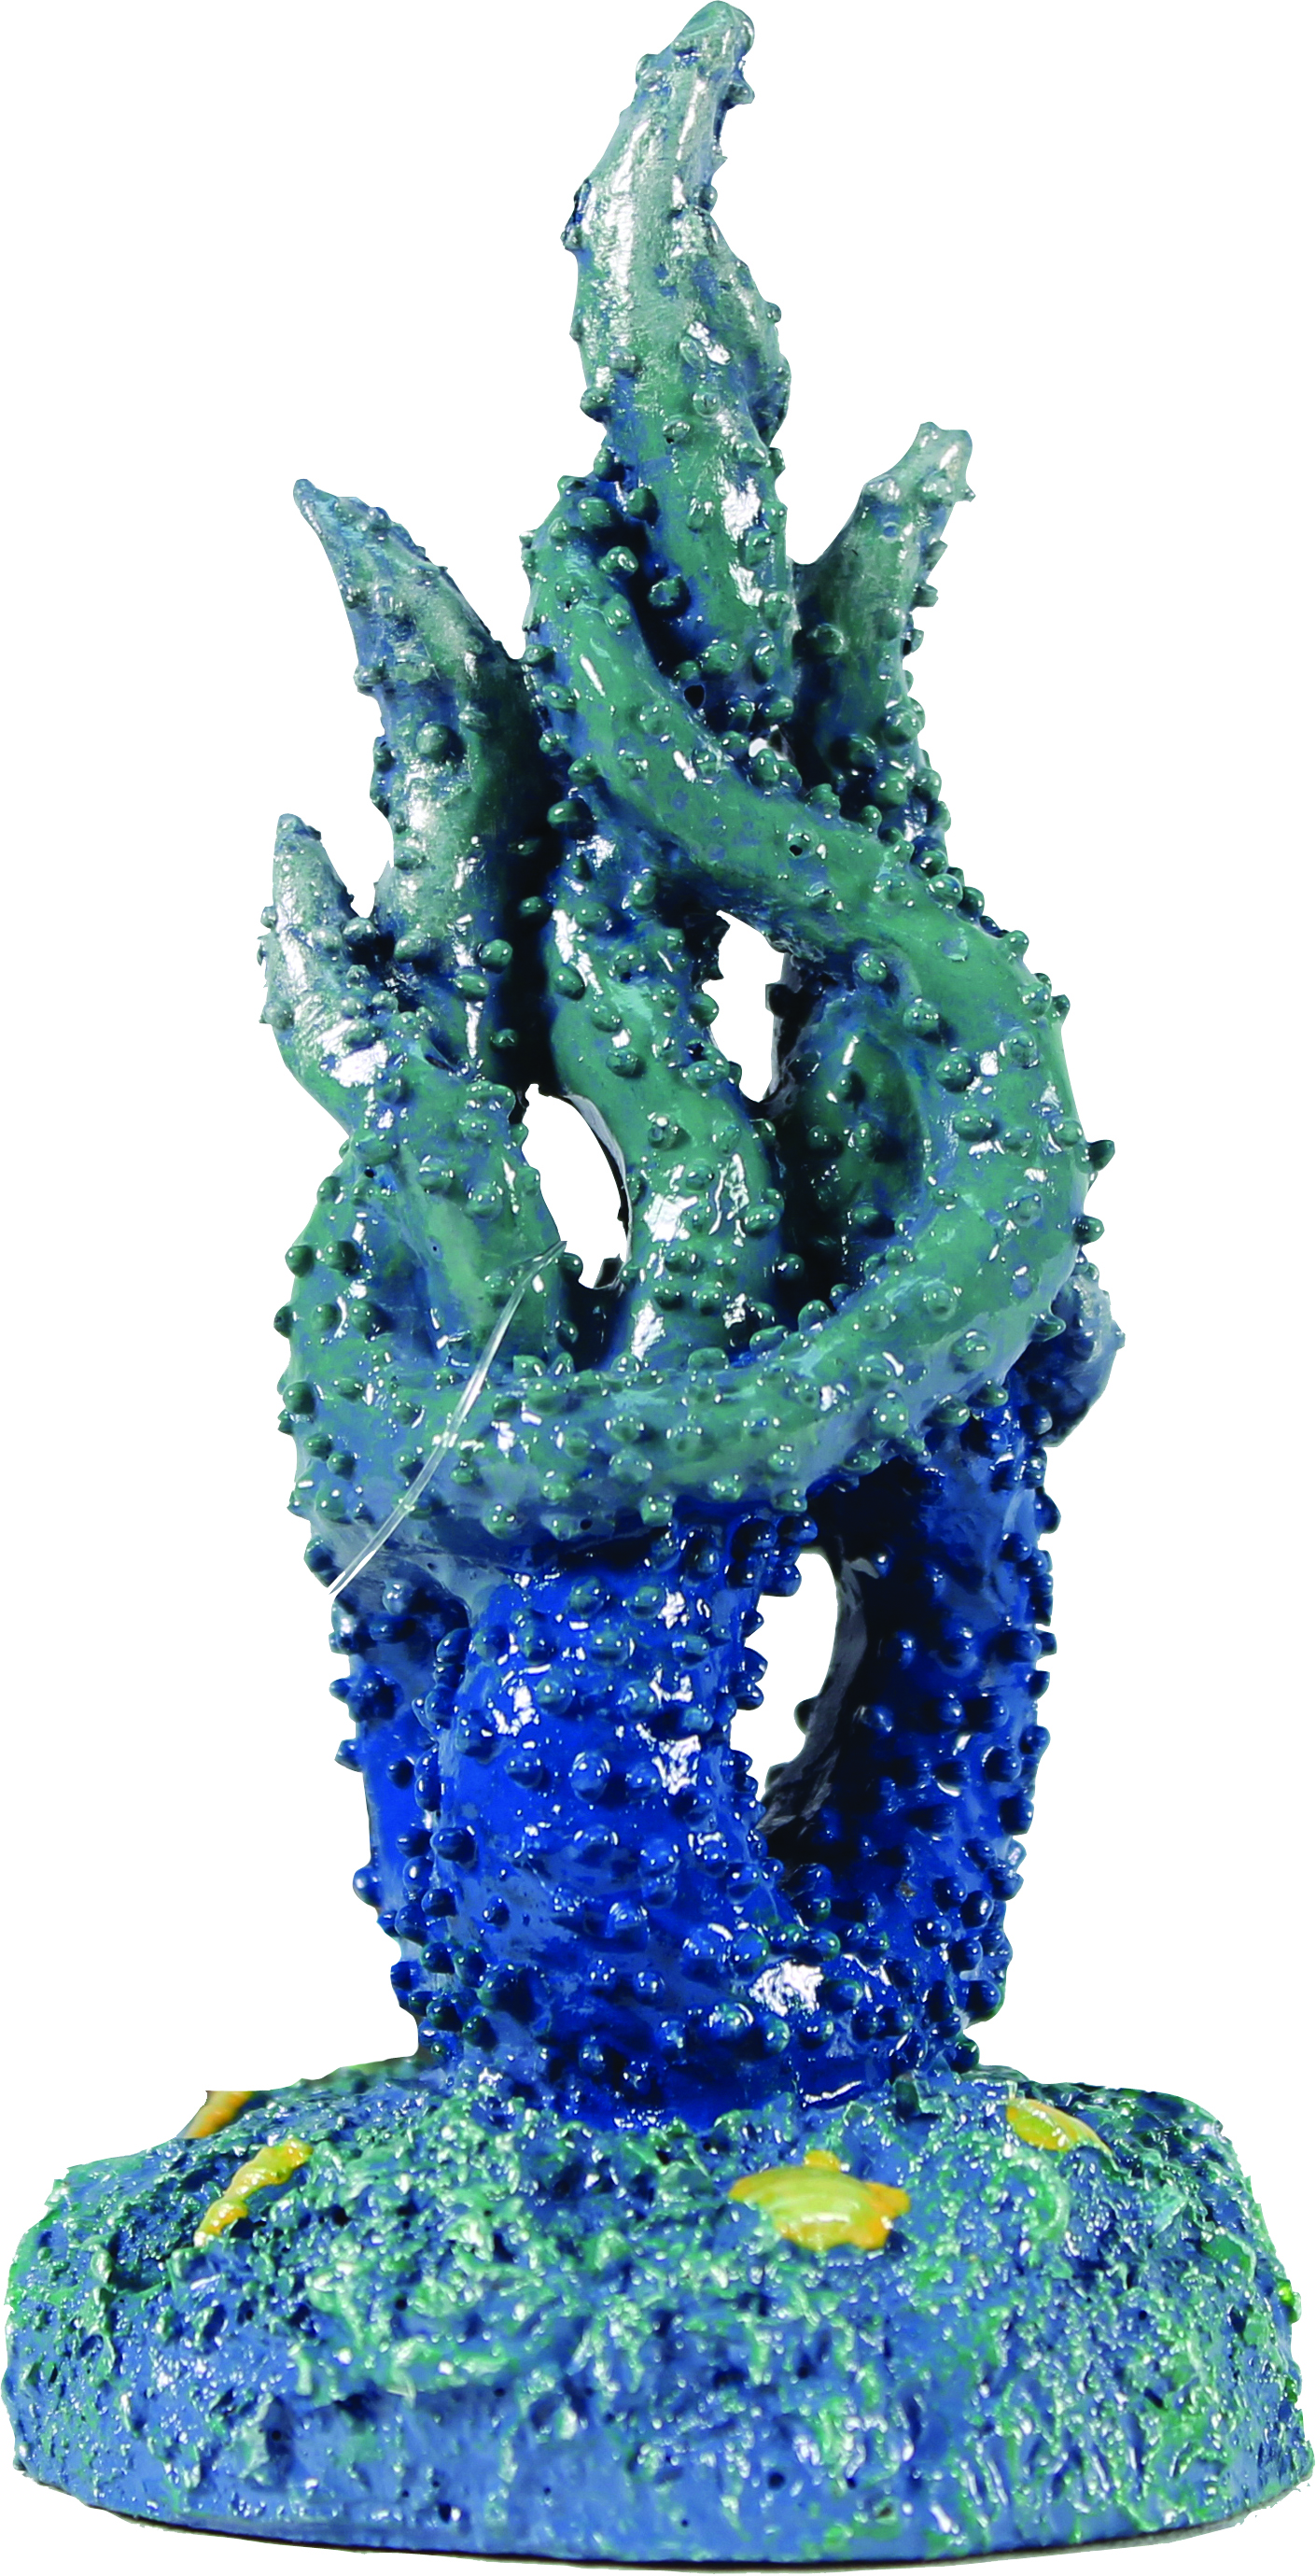 Glofish Seaweed Aquarium Ornament